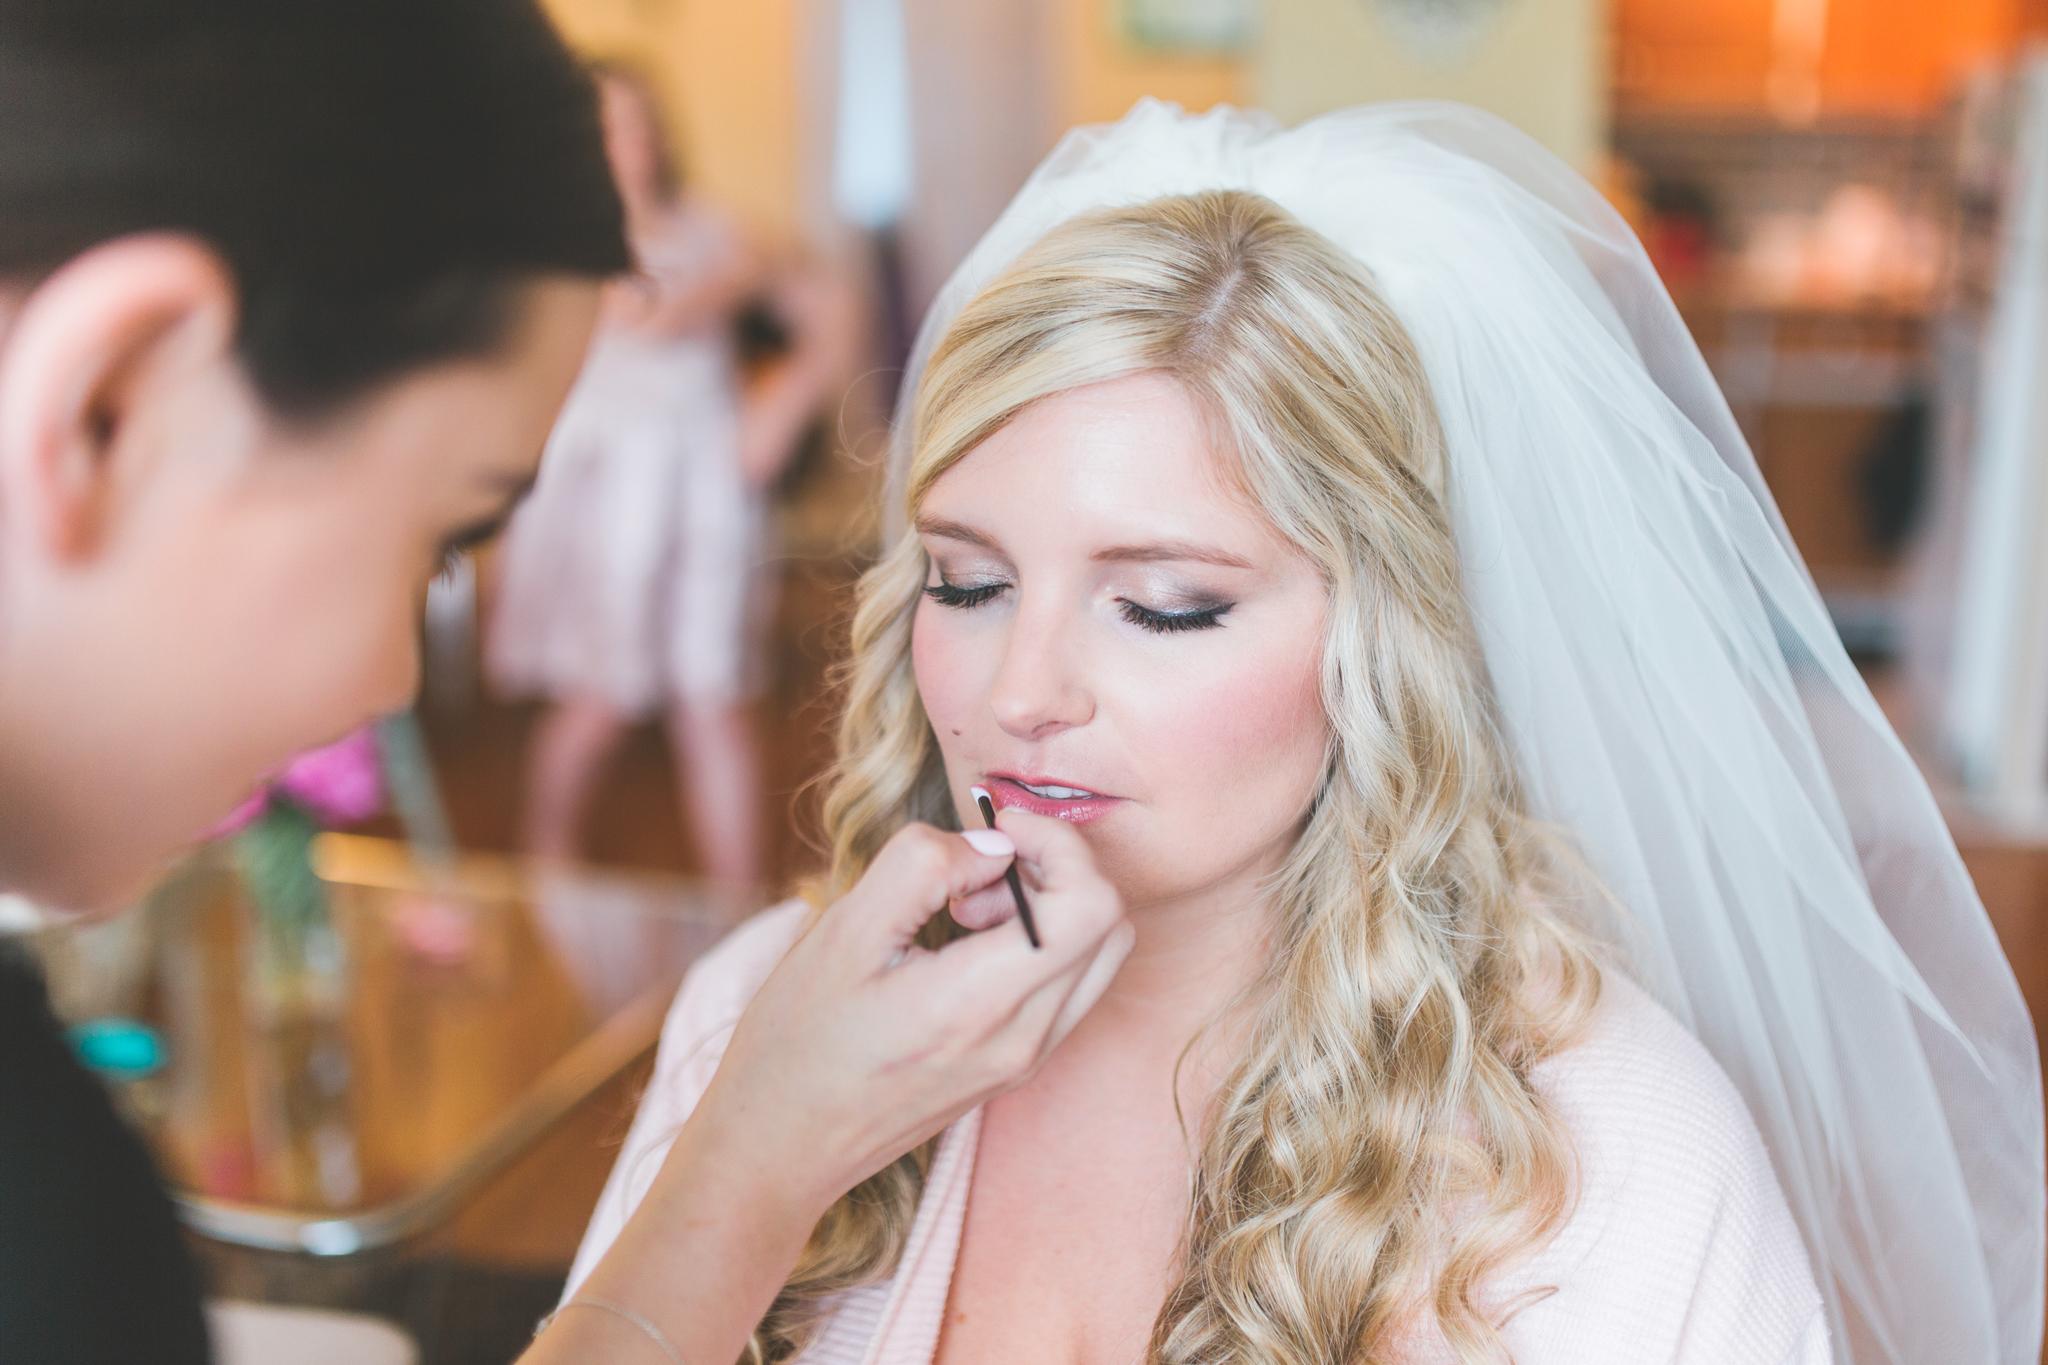 IMG_4424-VANCOUVER-WEDDING-PHOTOGRAPHER-JENNIFER-PICARD-PHOTOGRAPHY.jpg